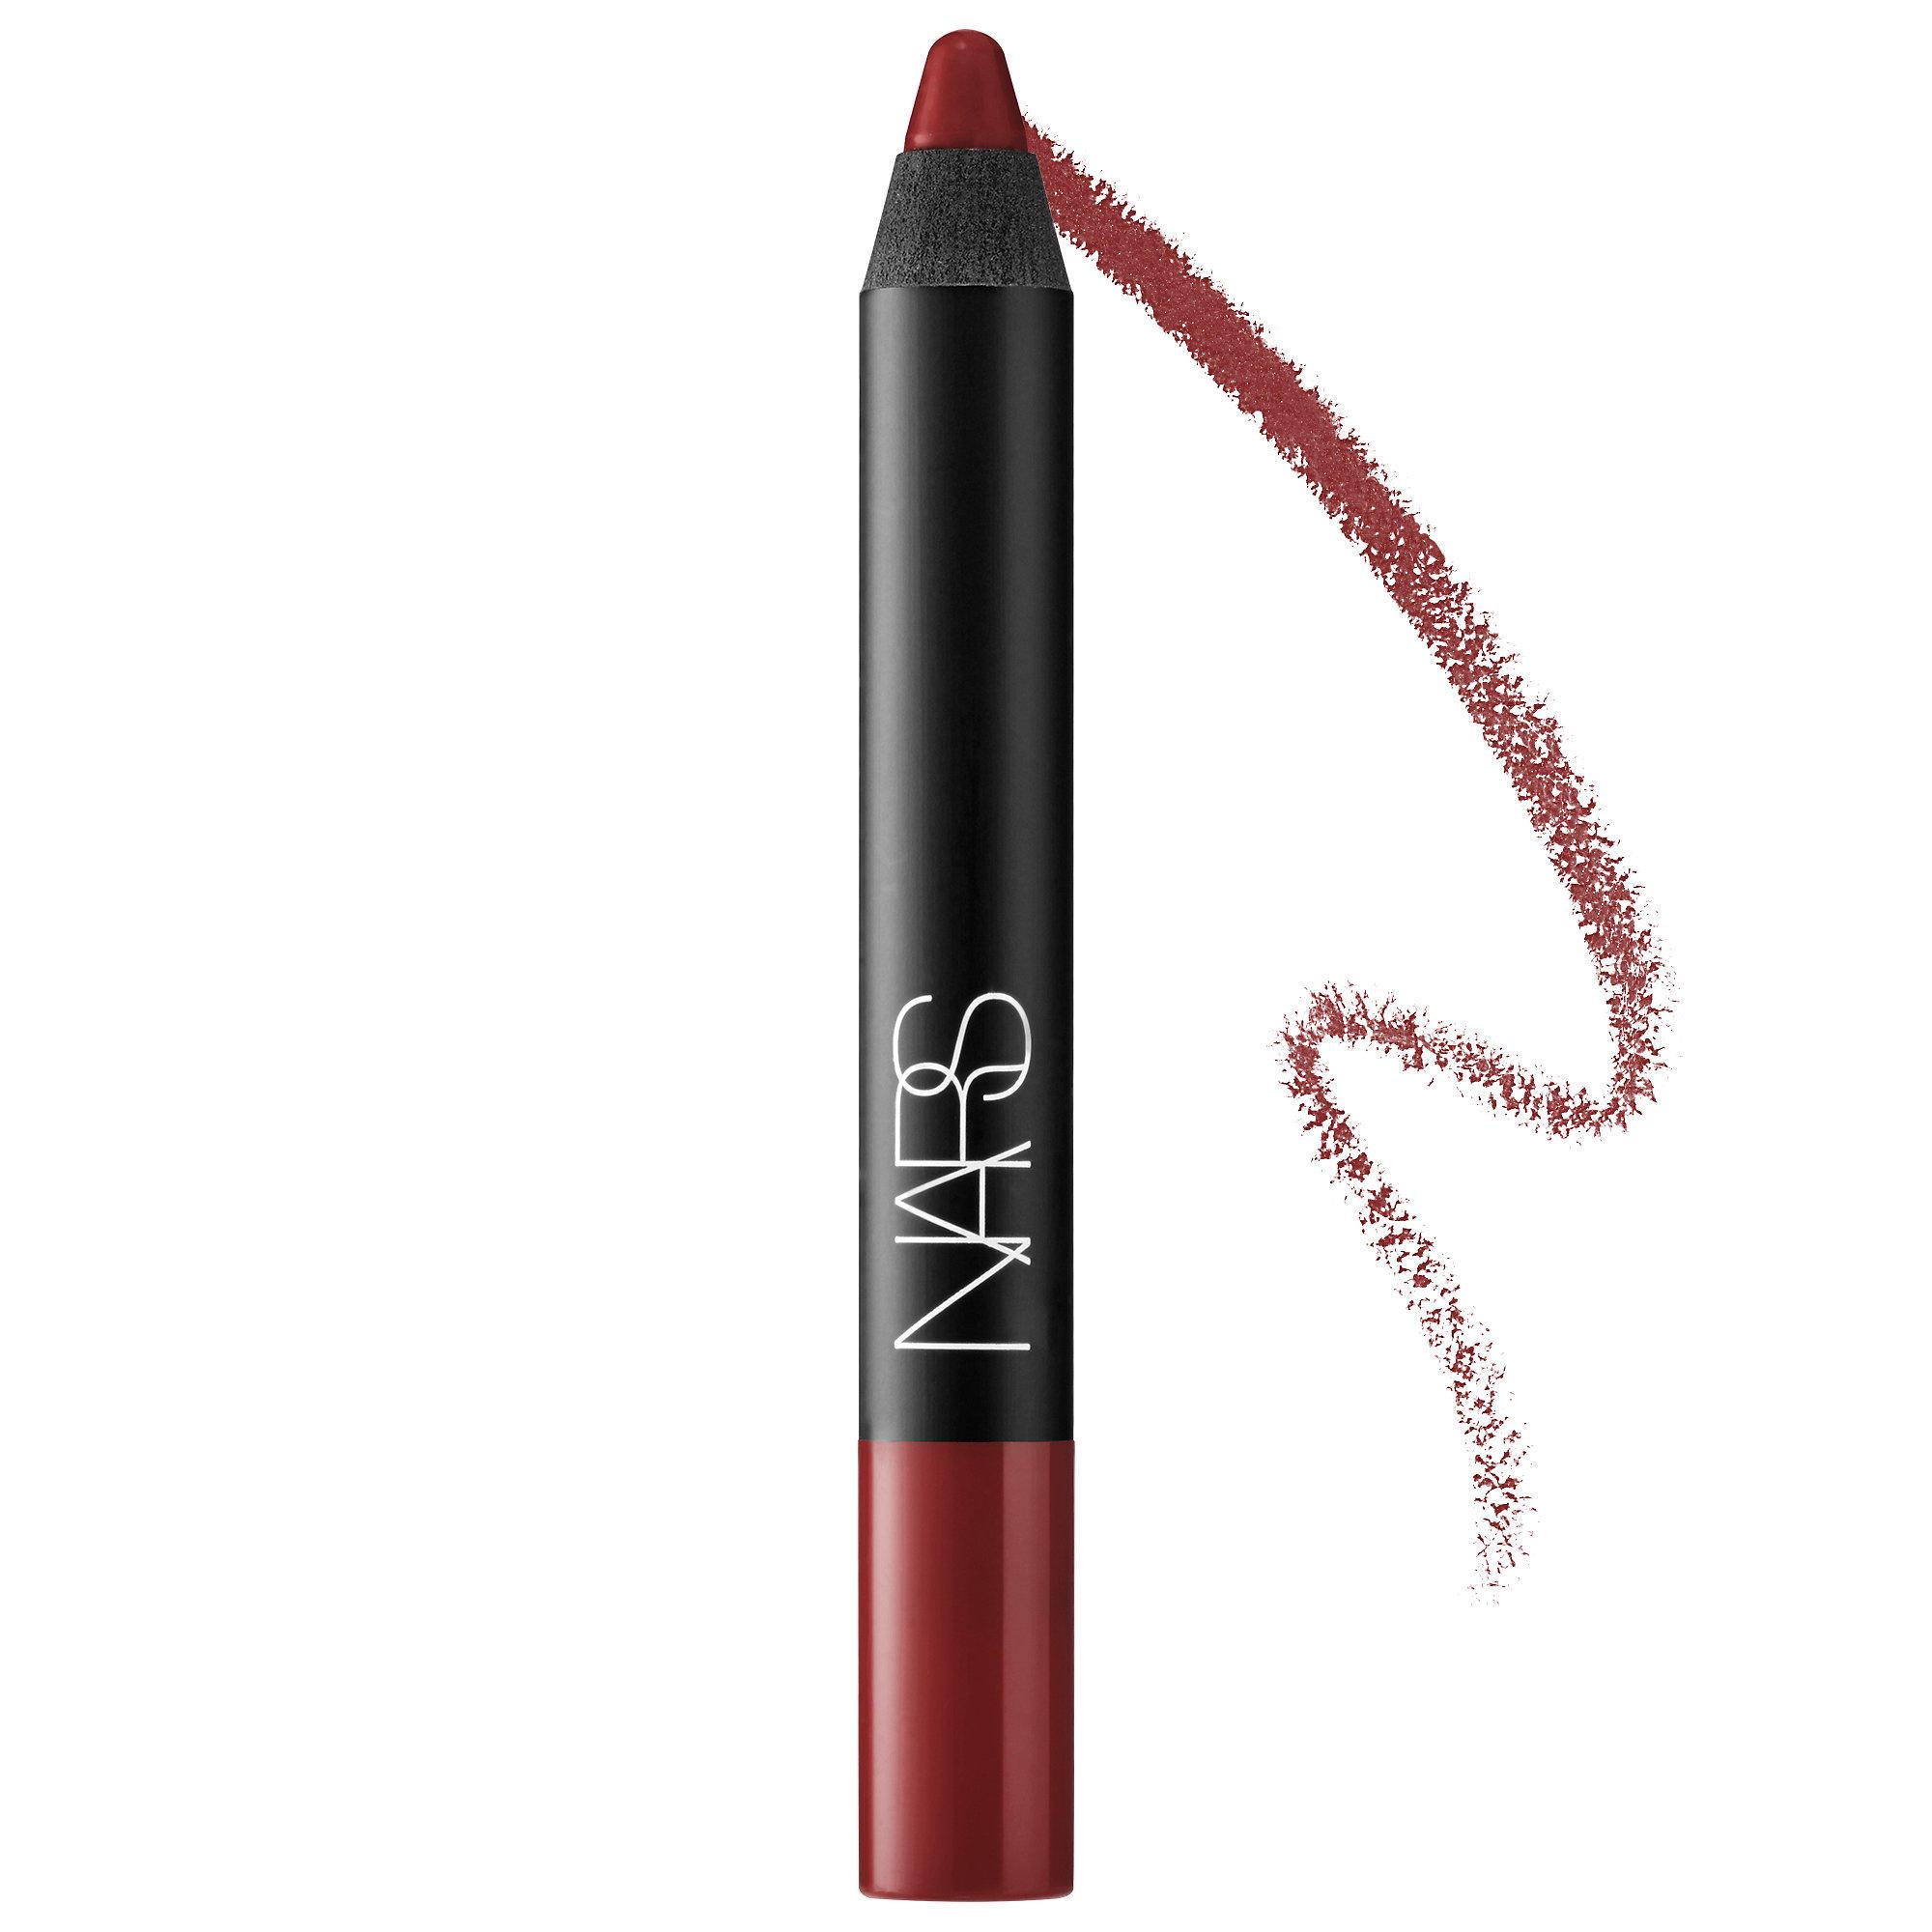 NARS Velvet Matte Lip Pencil Provocative Red